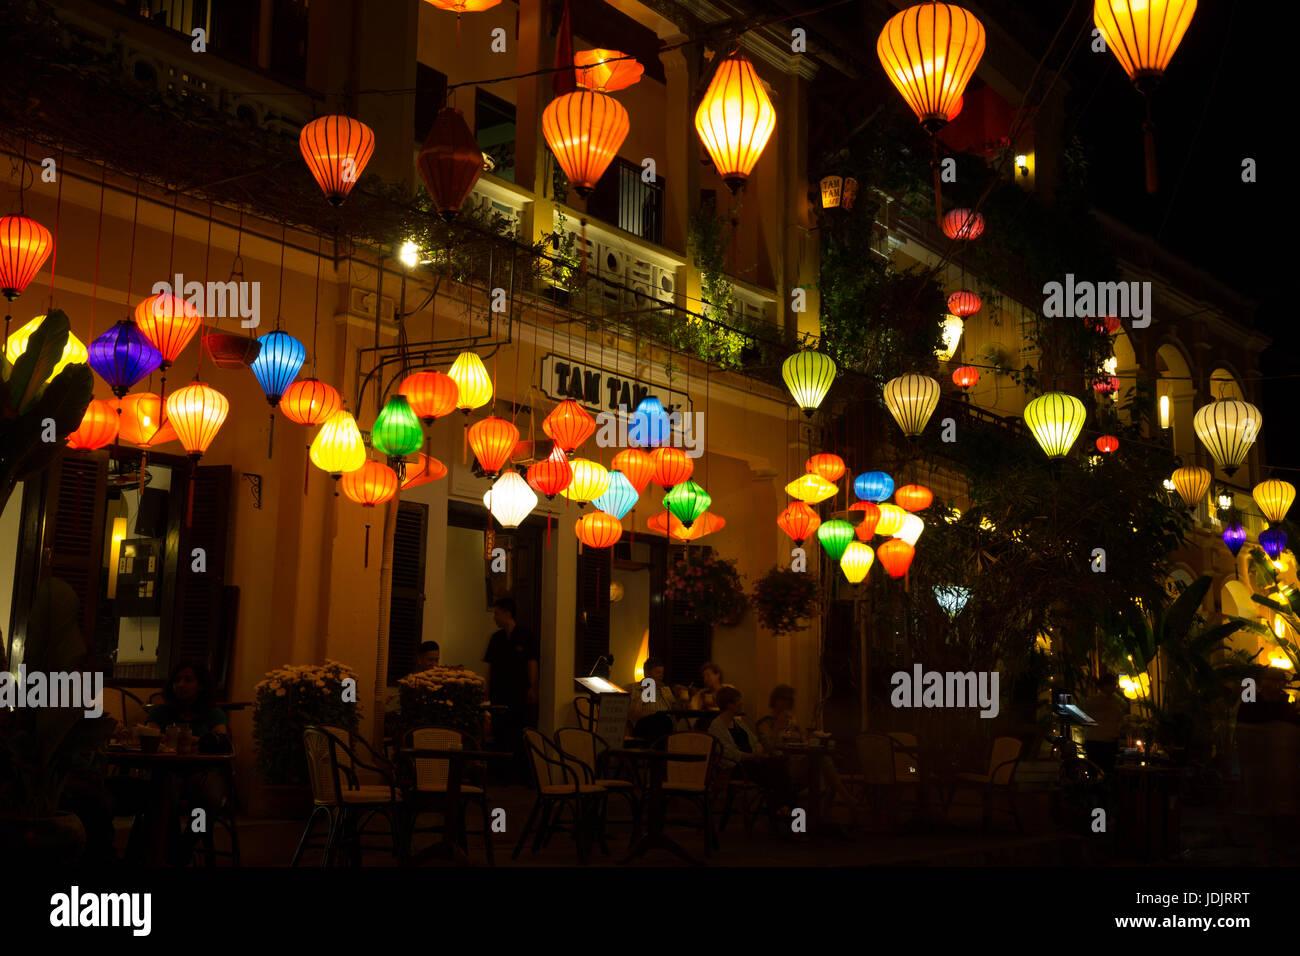 Hoi An Full Moon Lantern Festival Vietnam Stock Photo Alamy